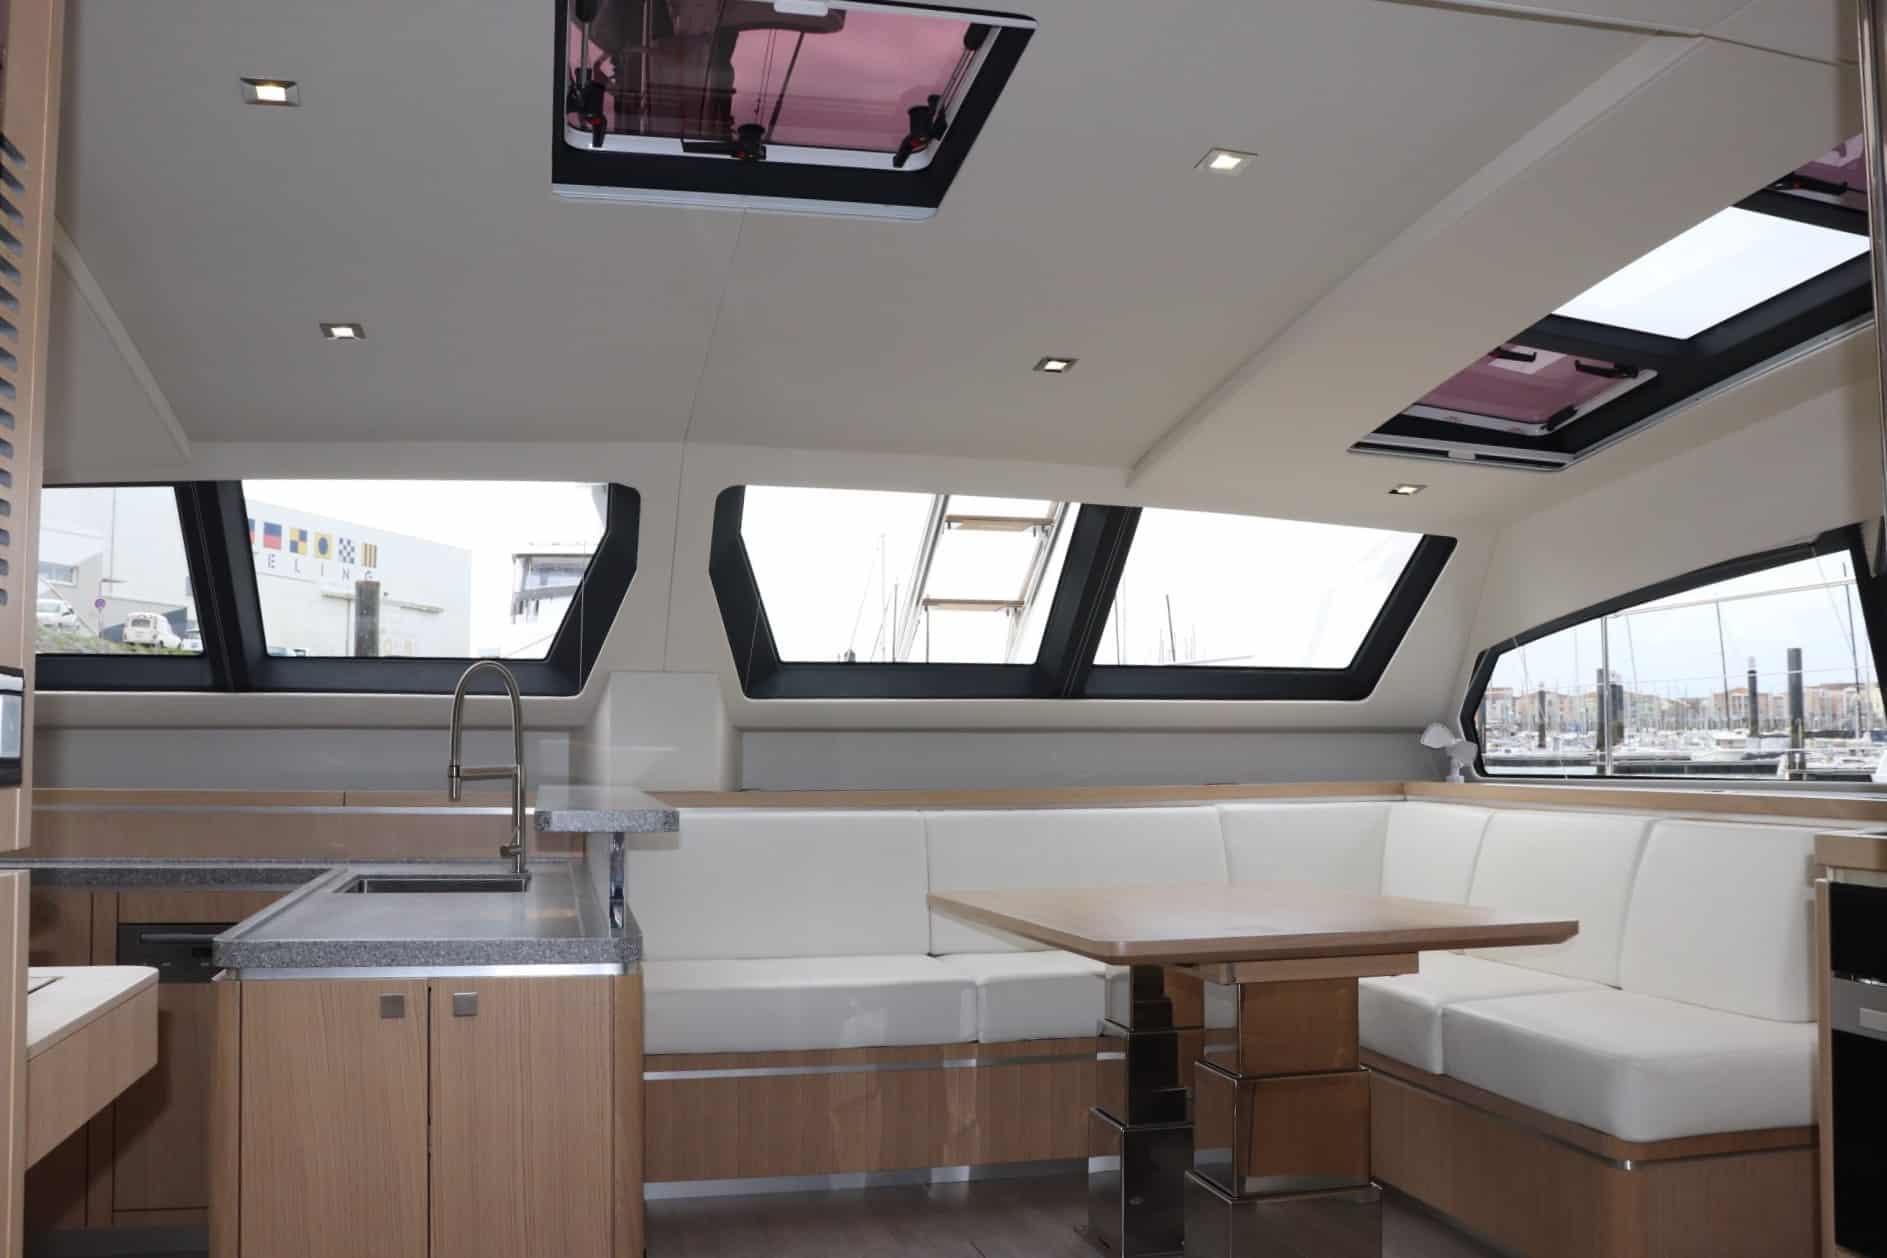 openning skylight